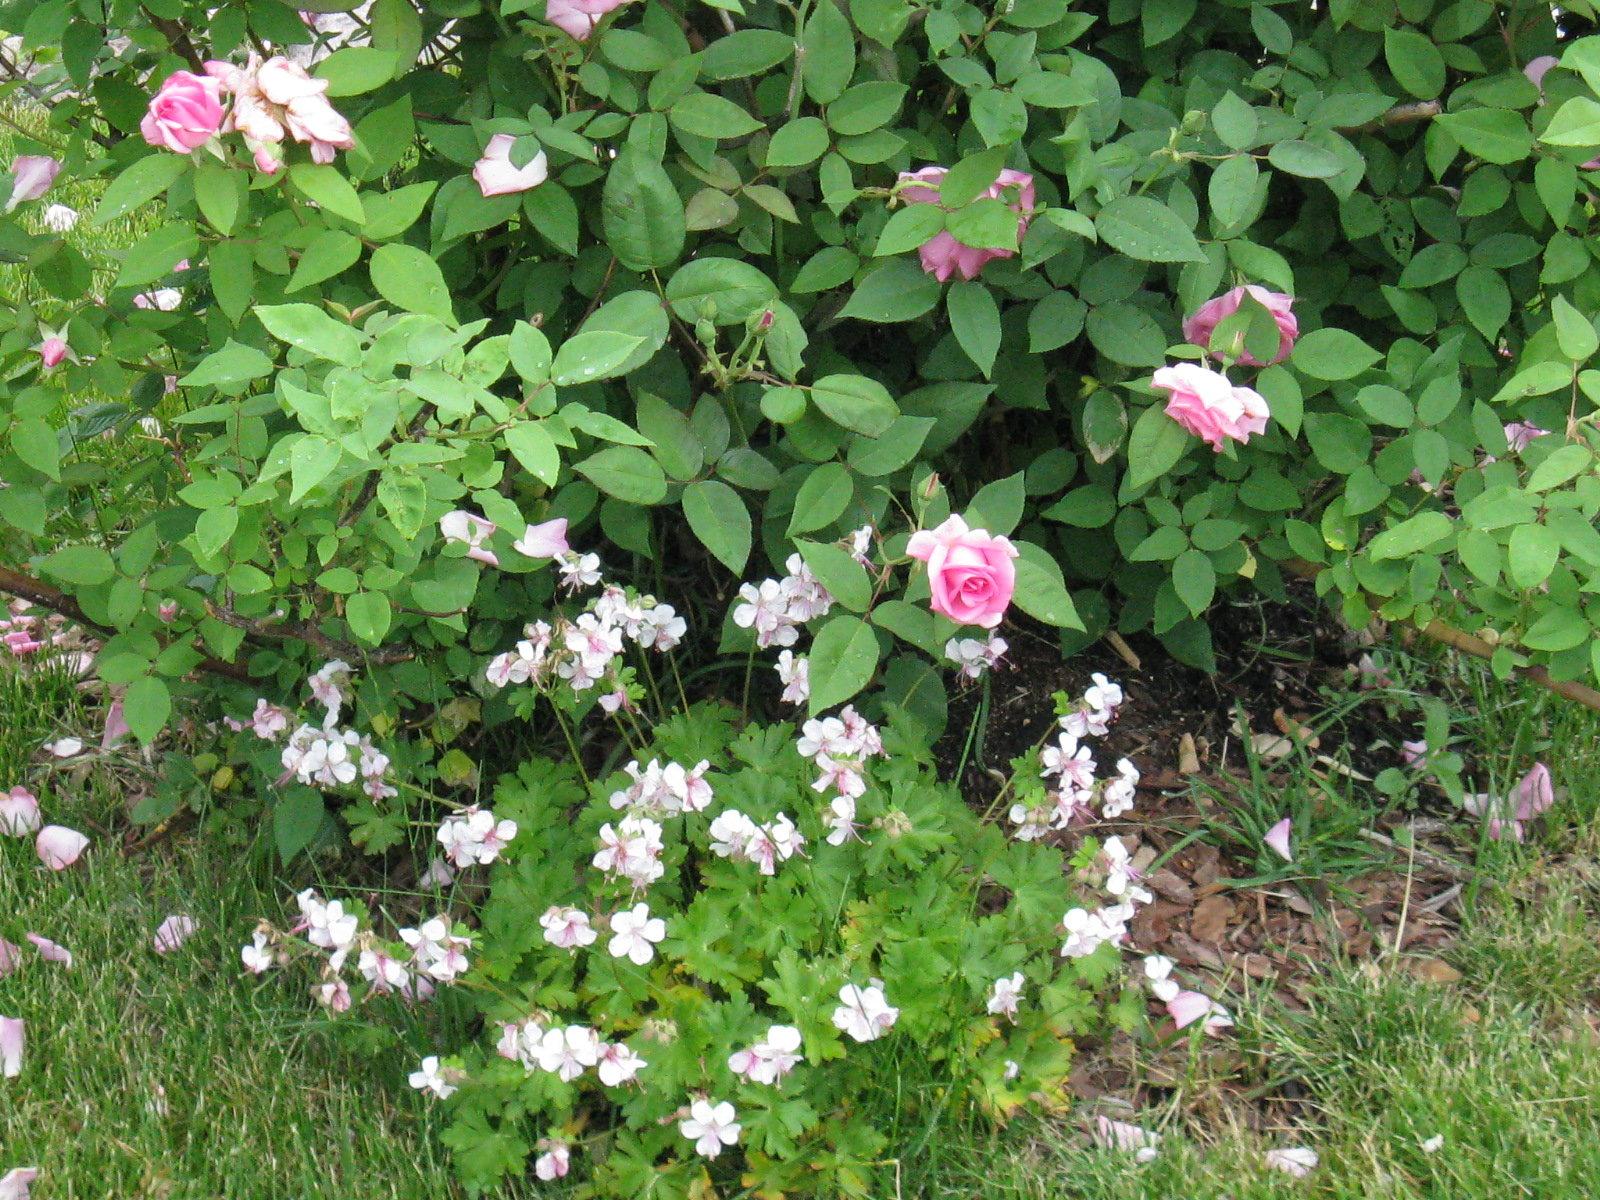 Geranium biokovo with rose Zephirine Drouhin